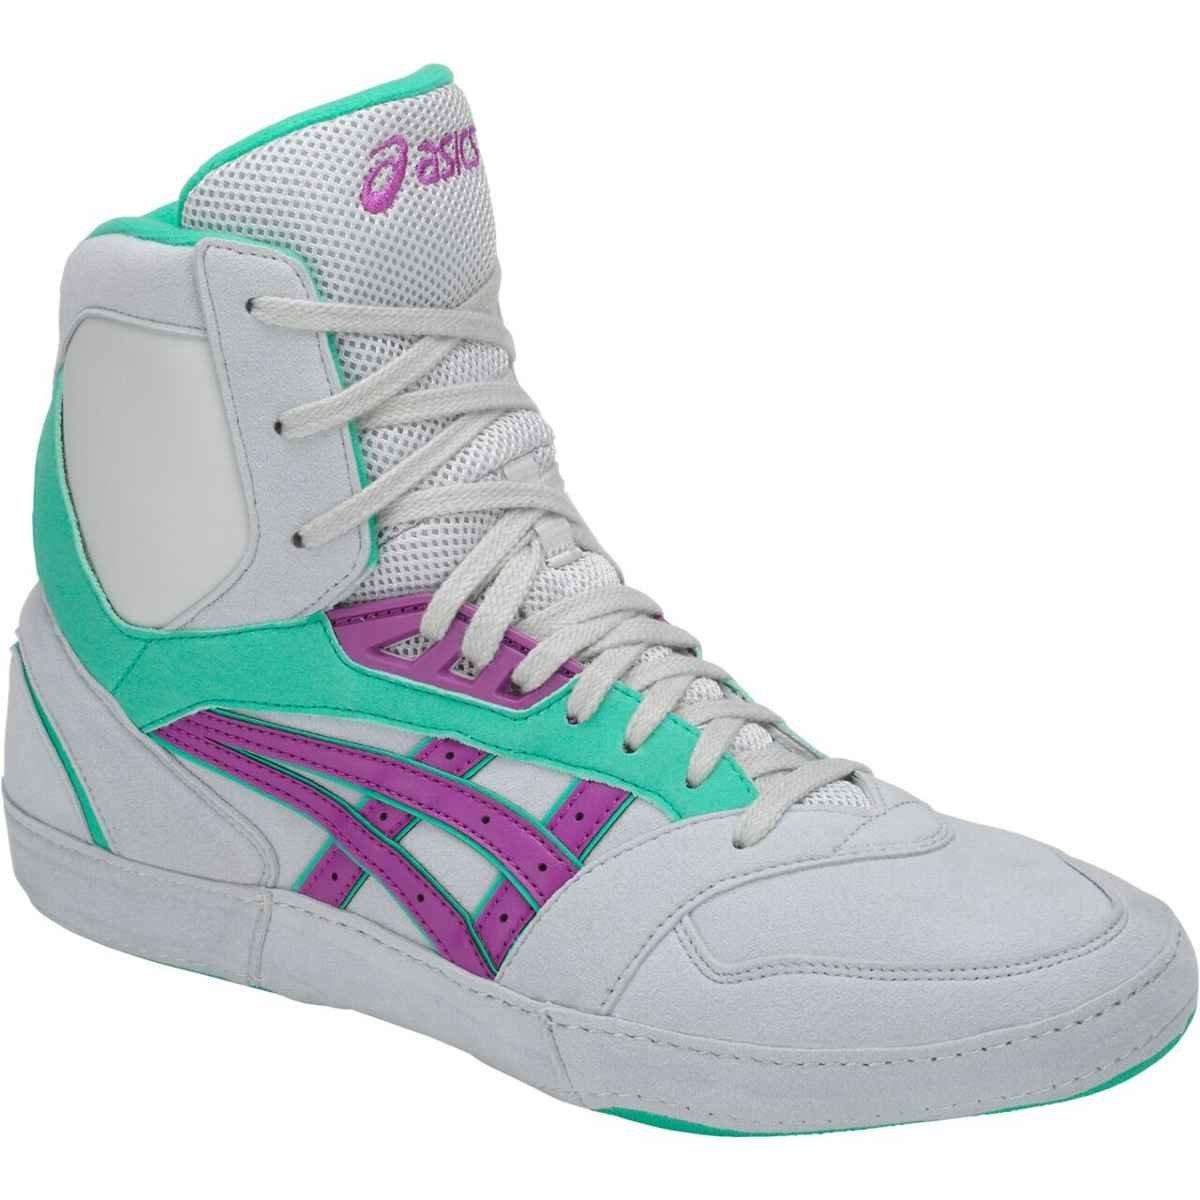 san francisco 28957 25083 Asics Unisex-Erwachsene Internationale Lyte Schuhe 46 EUGlacier Grey OrchidAtlantis